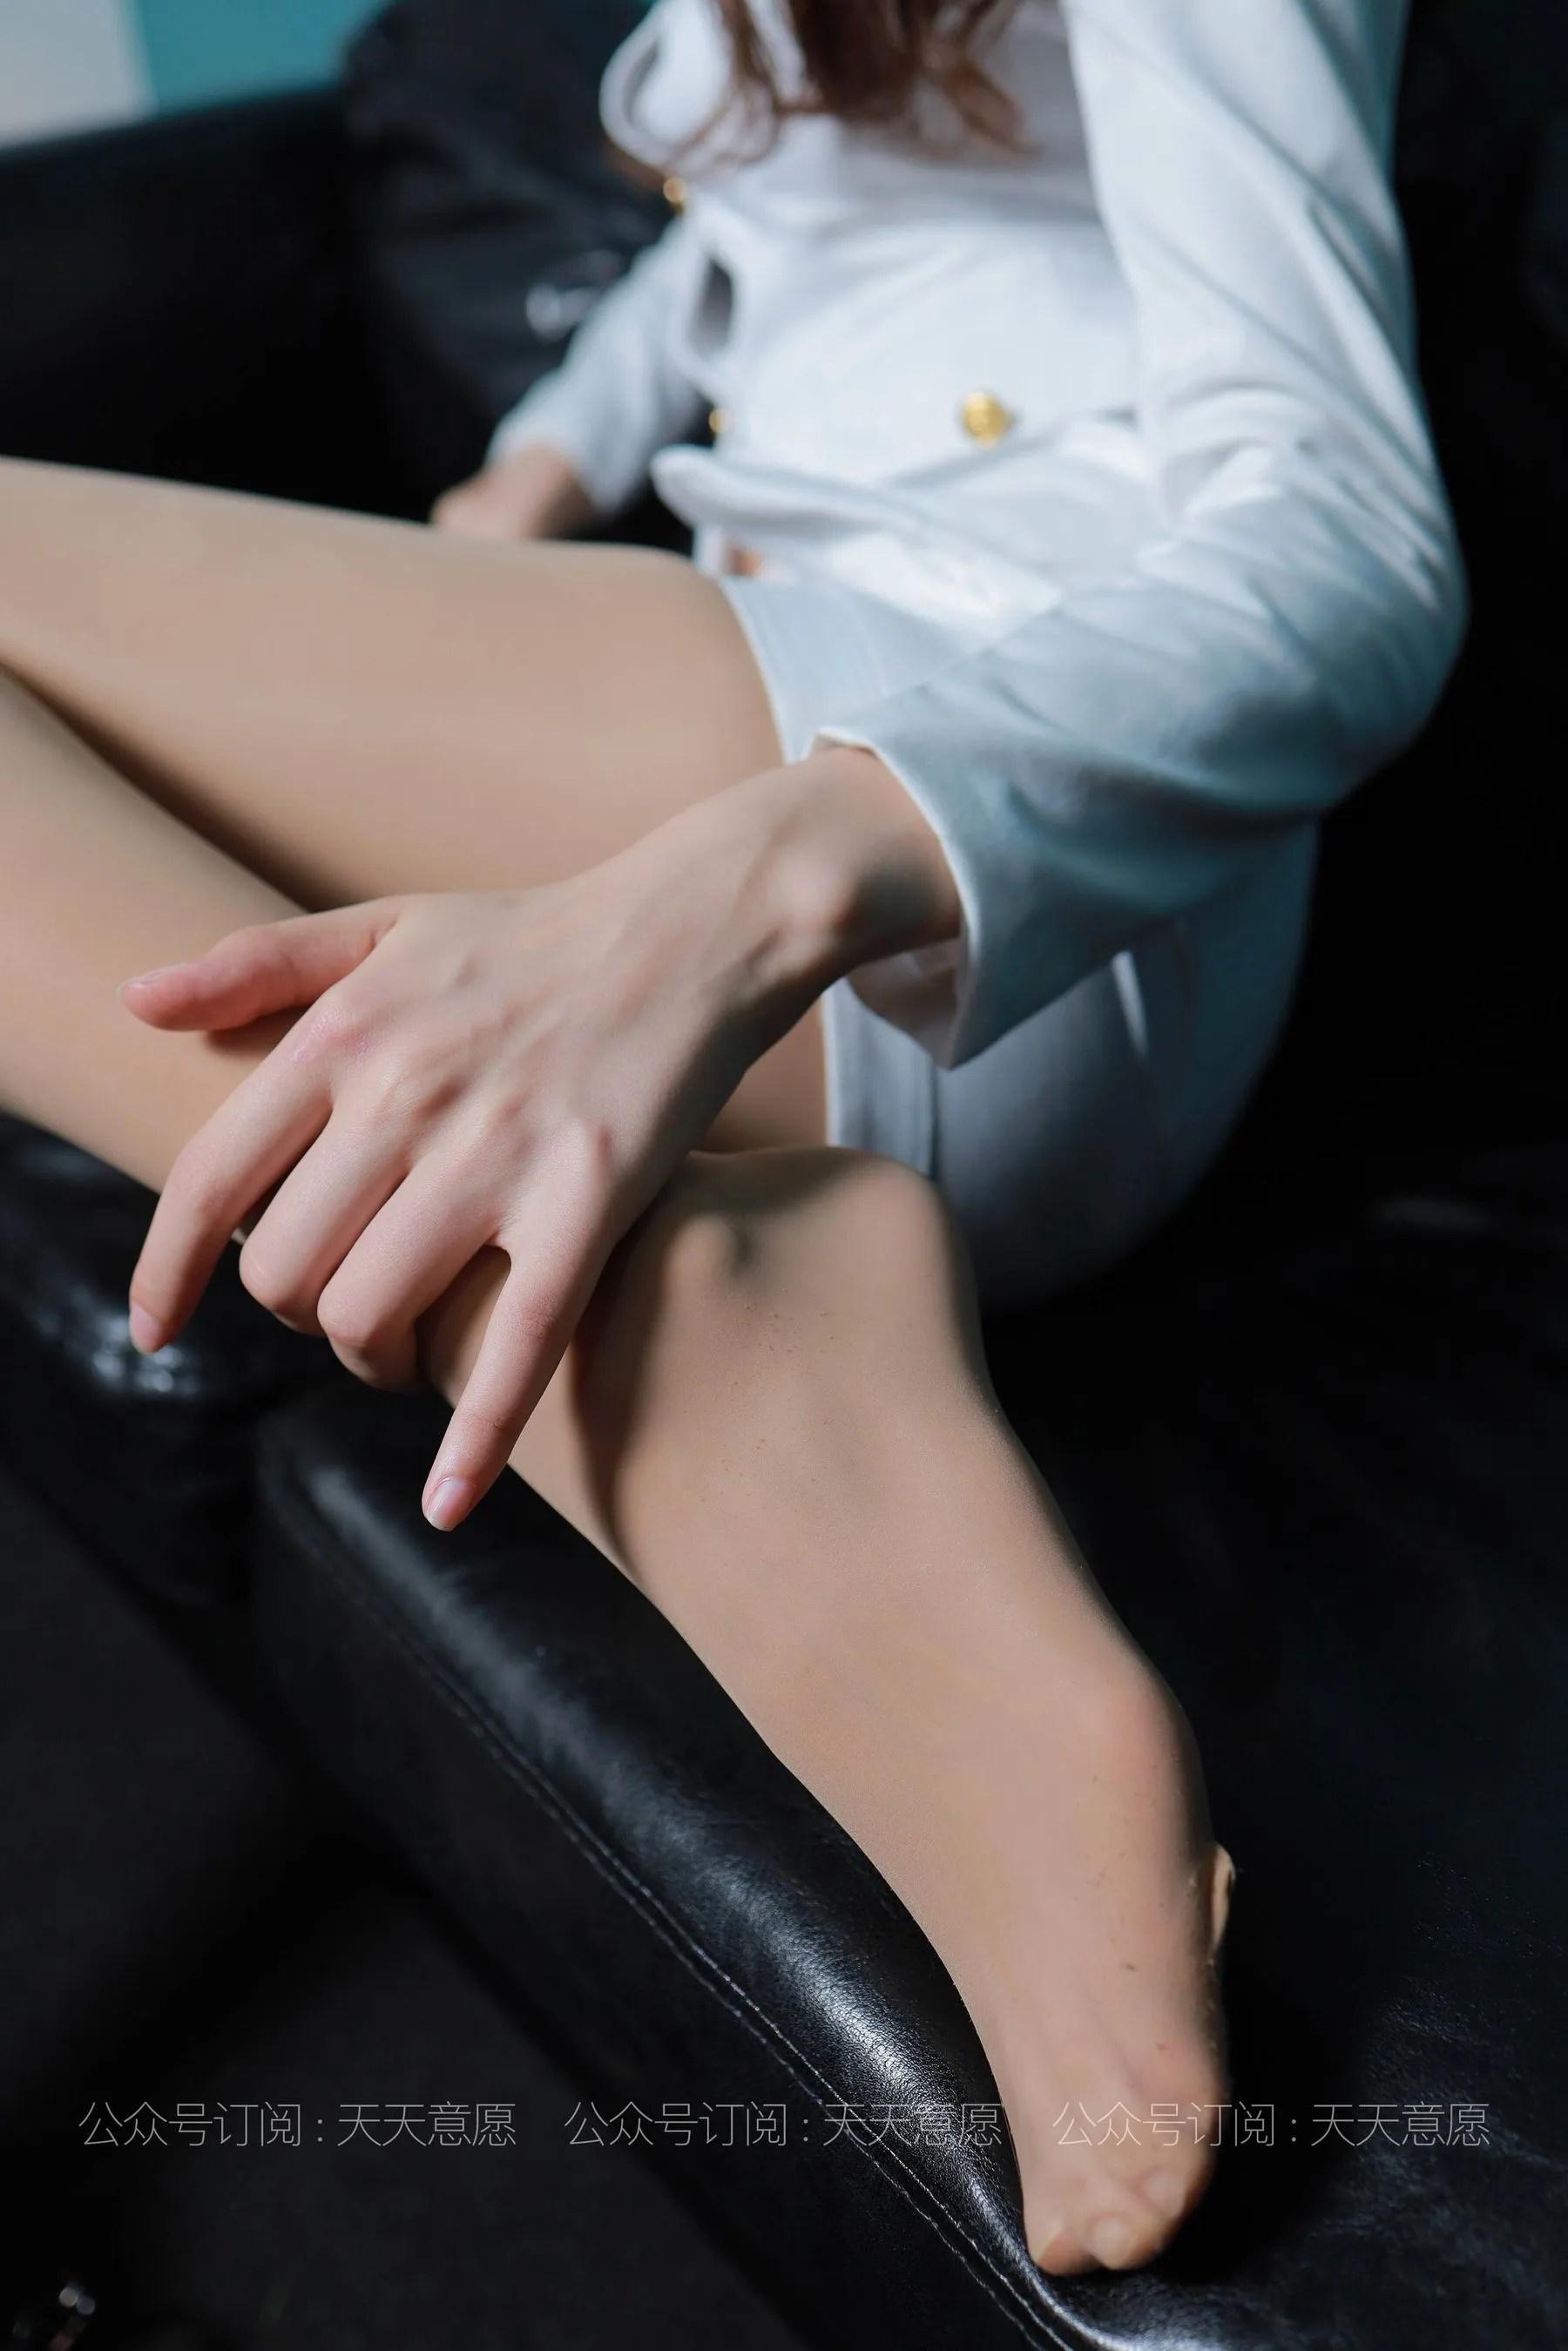 [IESS] 丝享家 768 肉肉《肉肉的白加黑》 丝袜美腿写真[79P]插图(8)